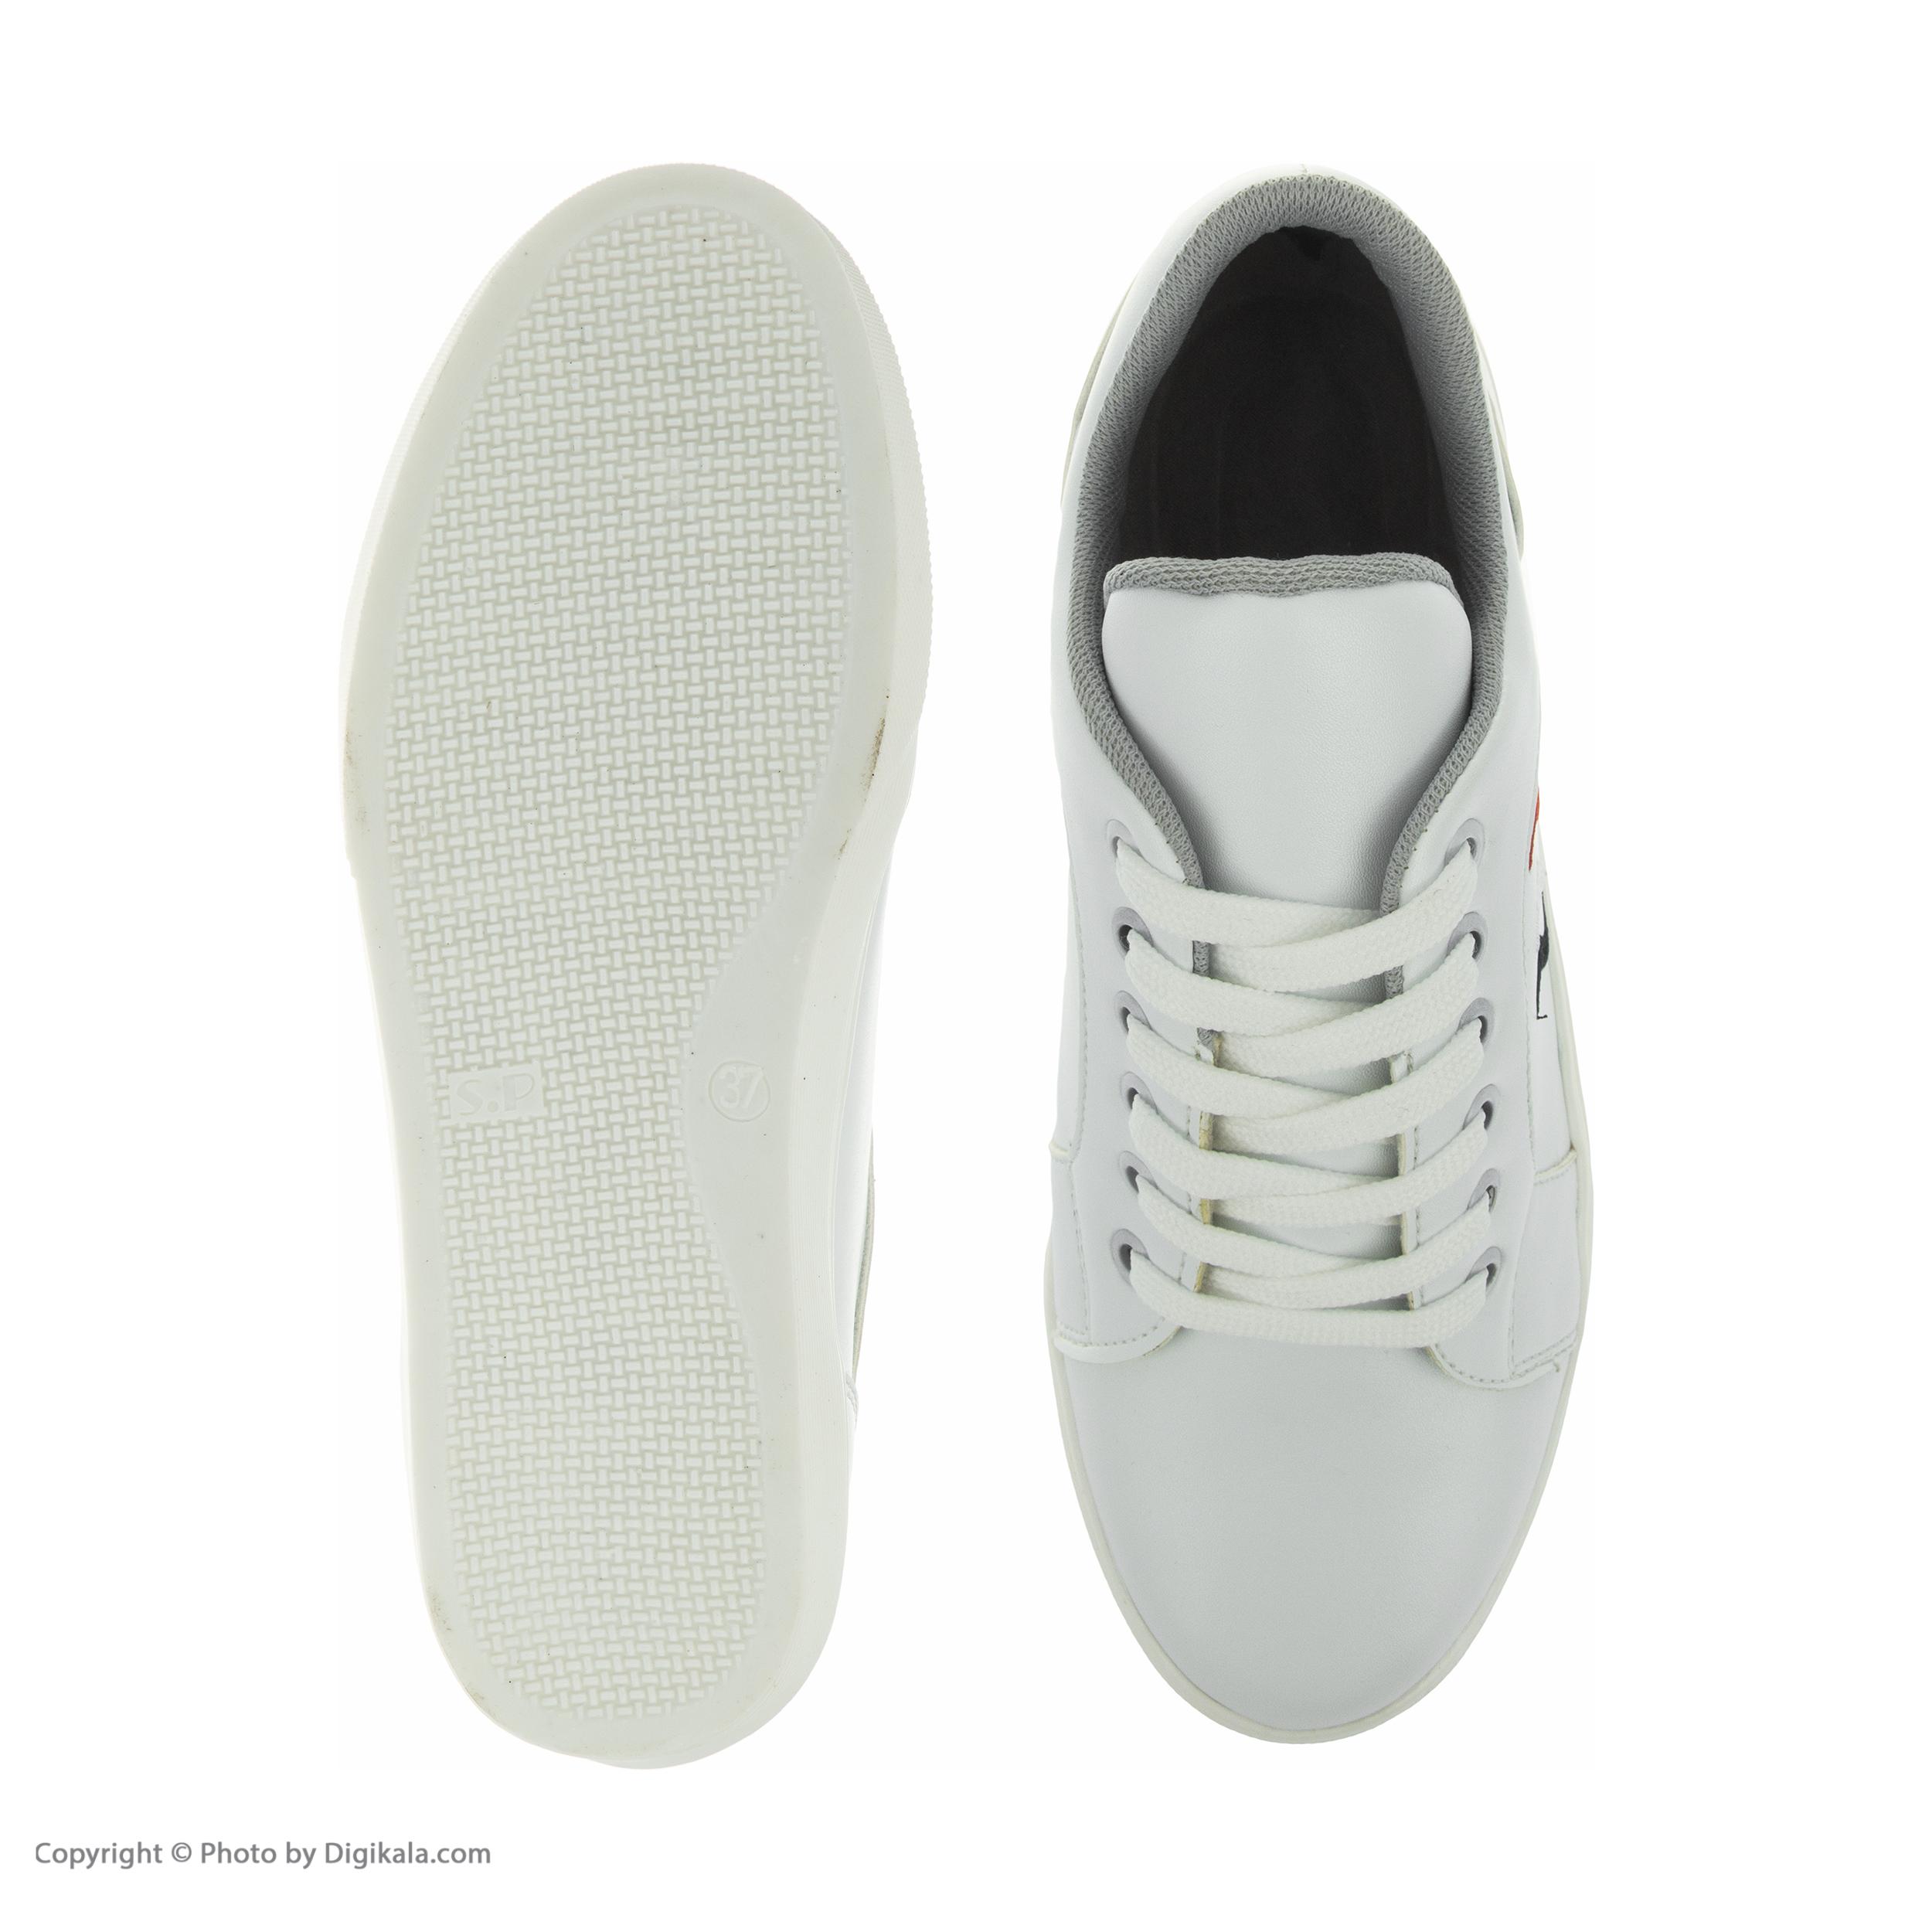 کفش روزمره زنانه مدل 4032 -  - 6